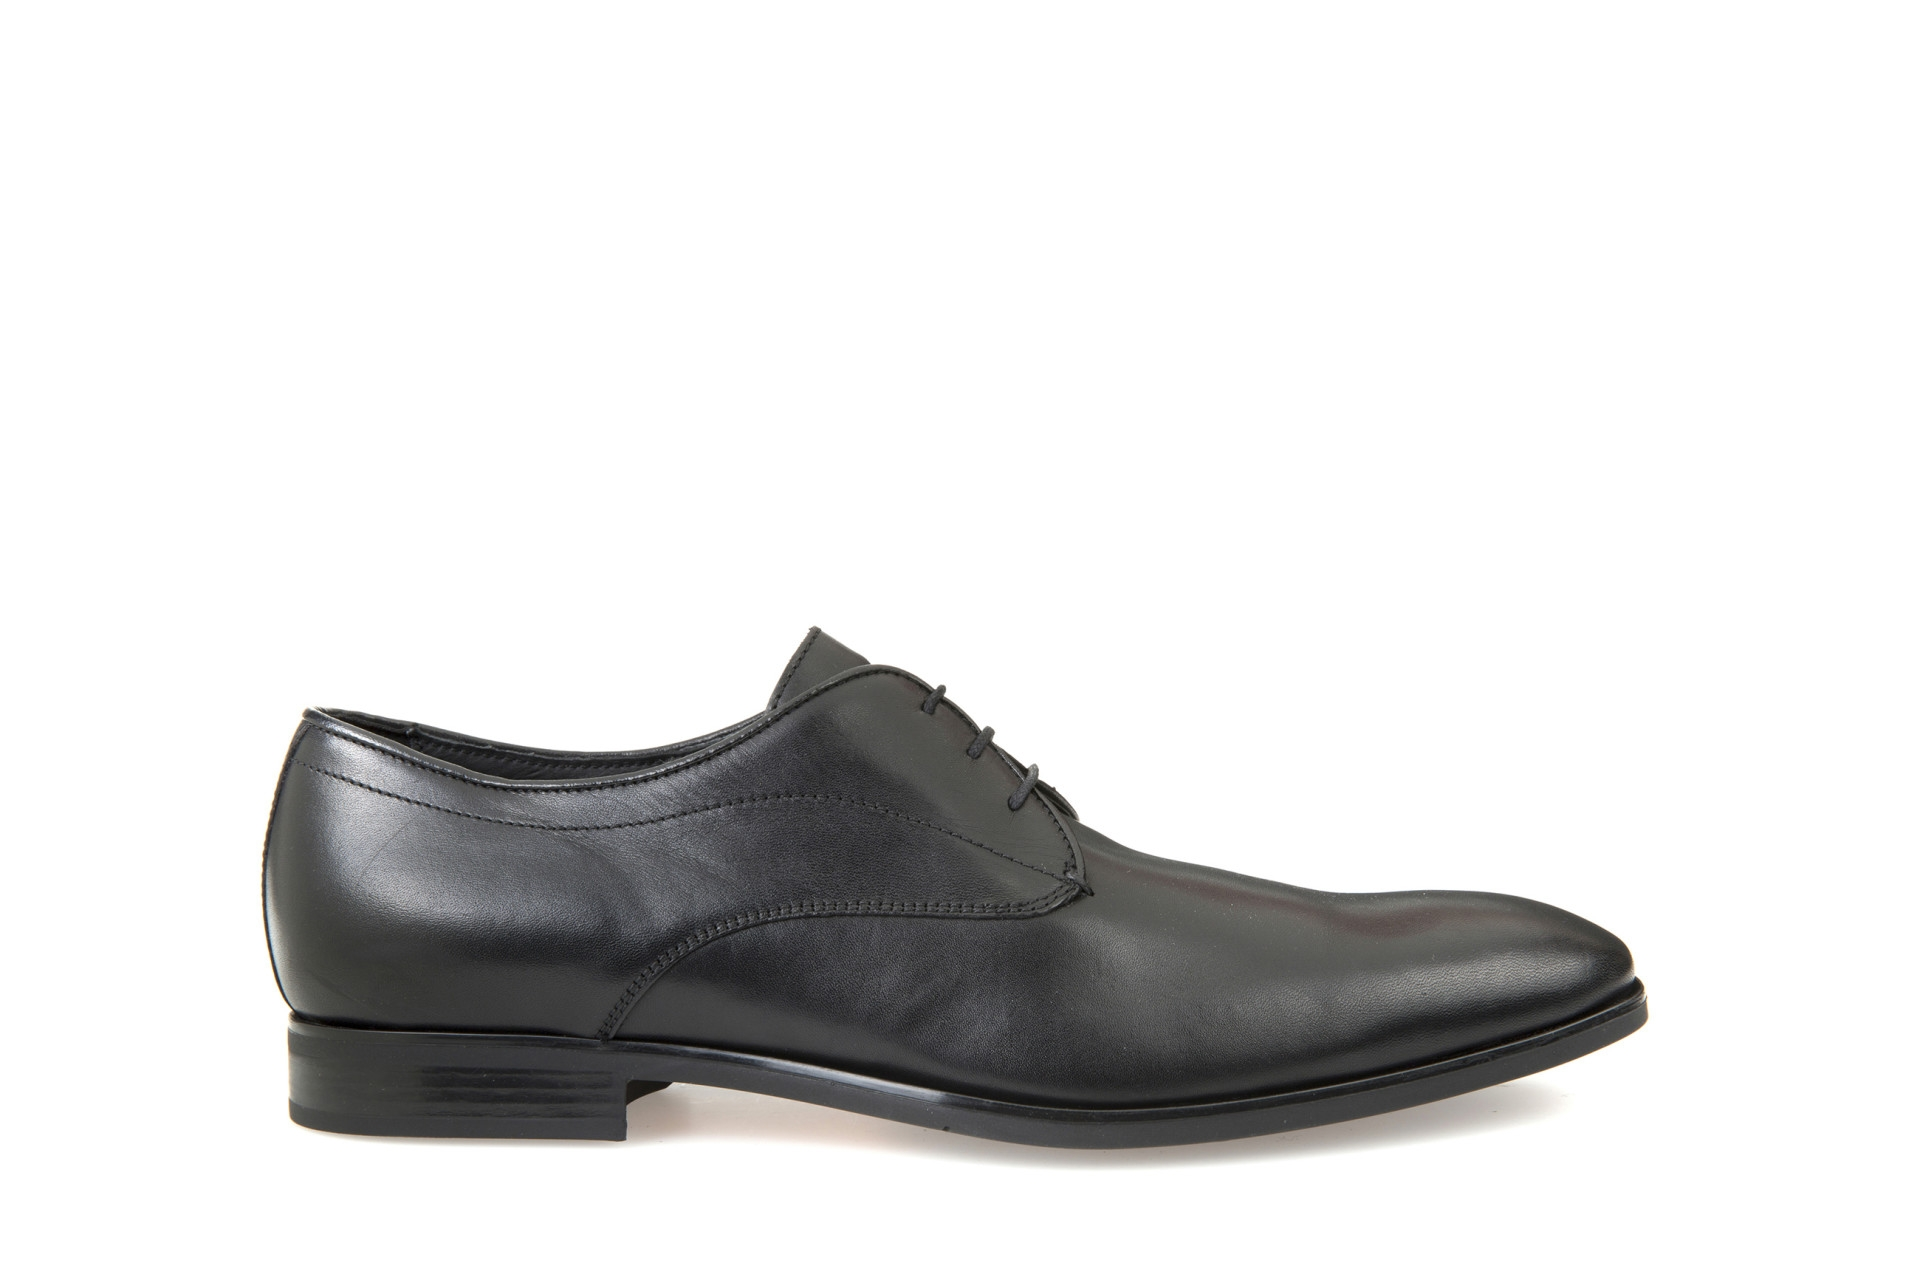 Geox Mens Shoe | New Life | Black